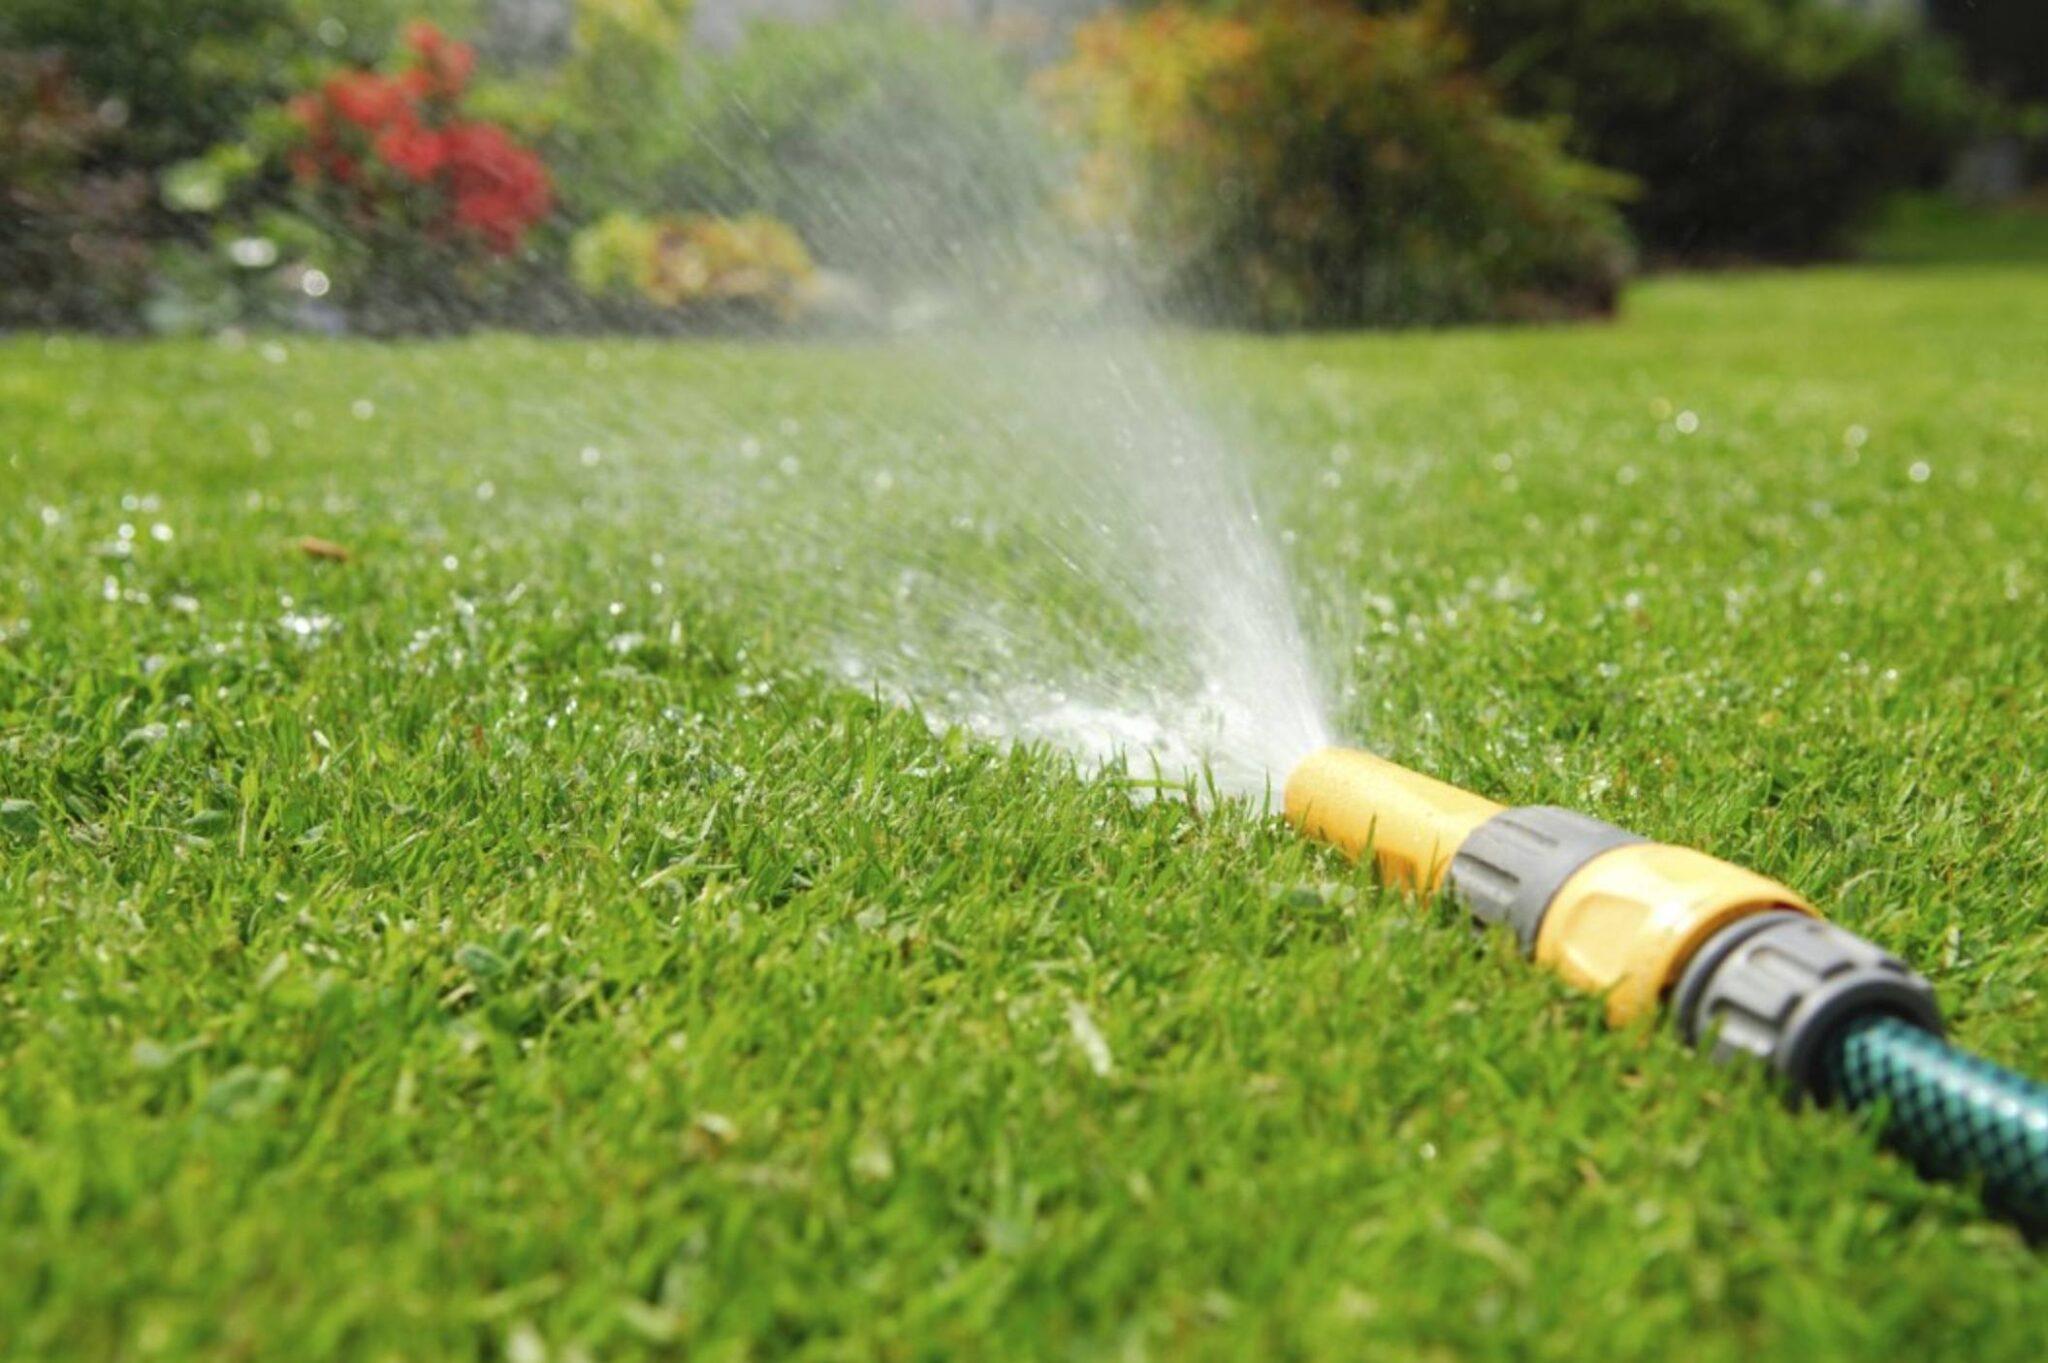 автоматичний полив газону